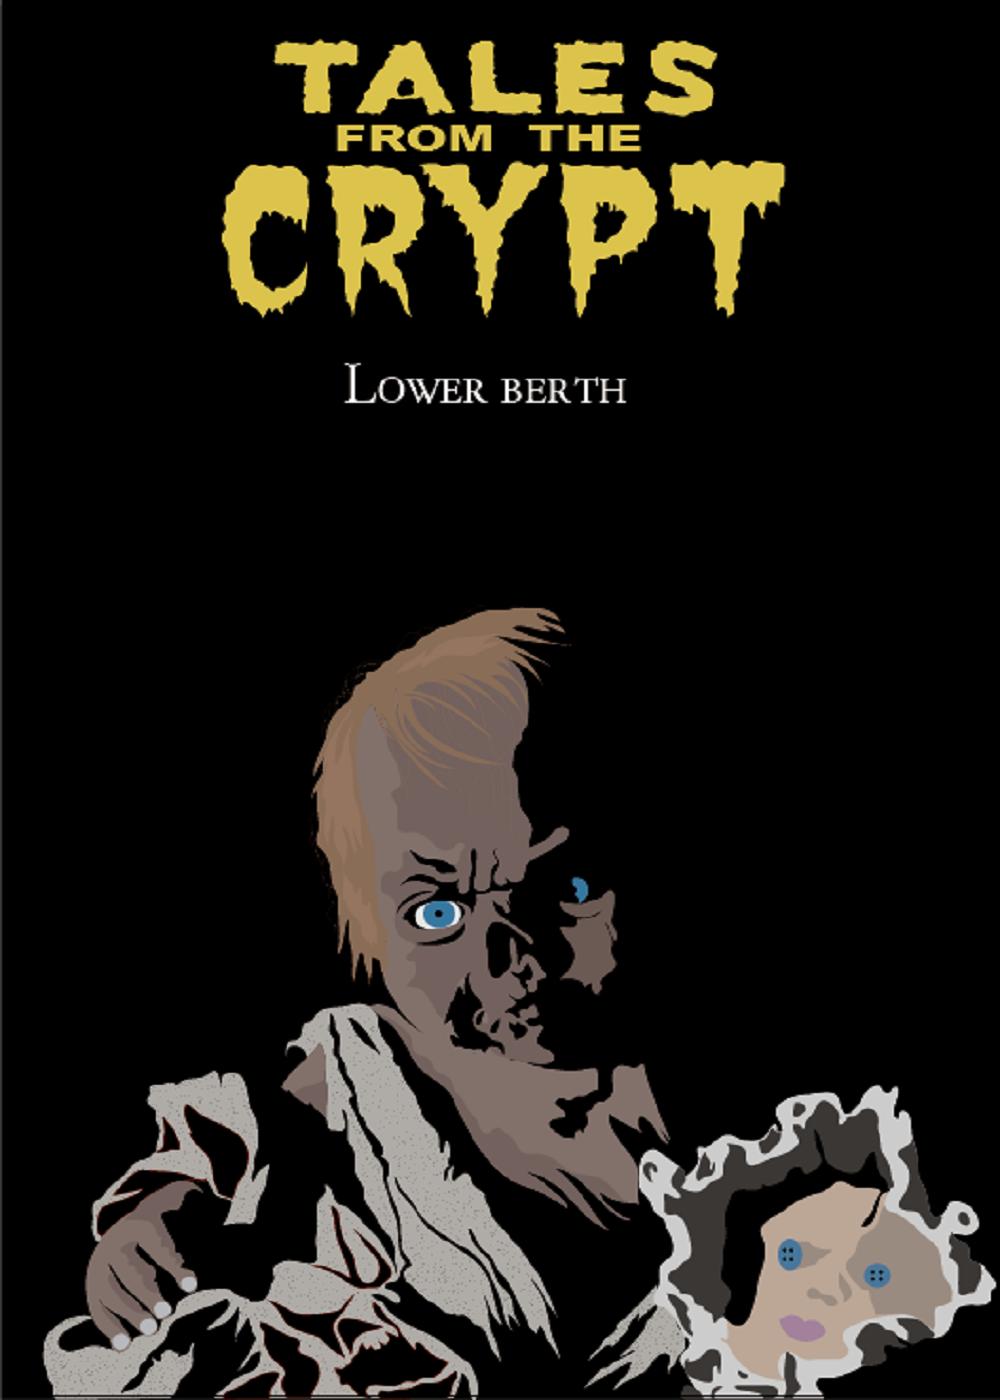 Lower_Berth_Copy